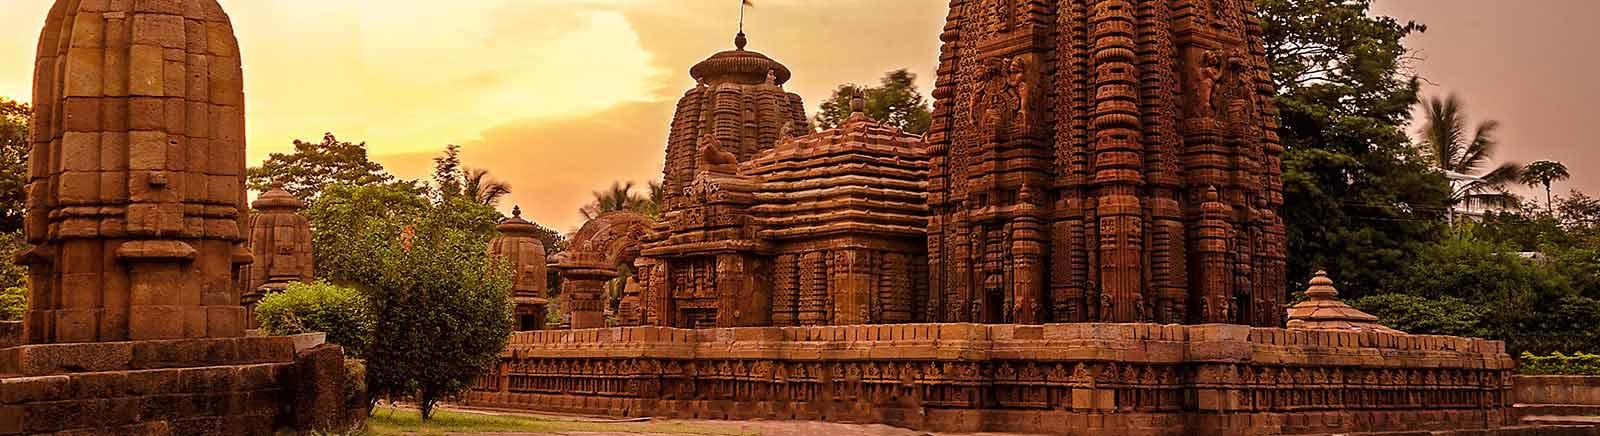 In & Around Bhubaneswar, Odisha